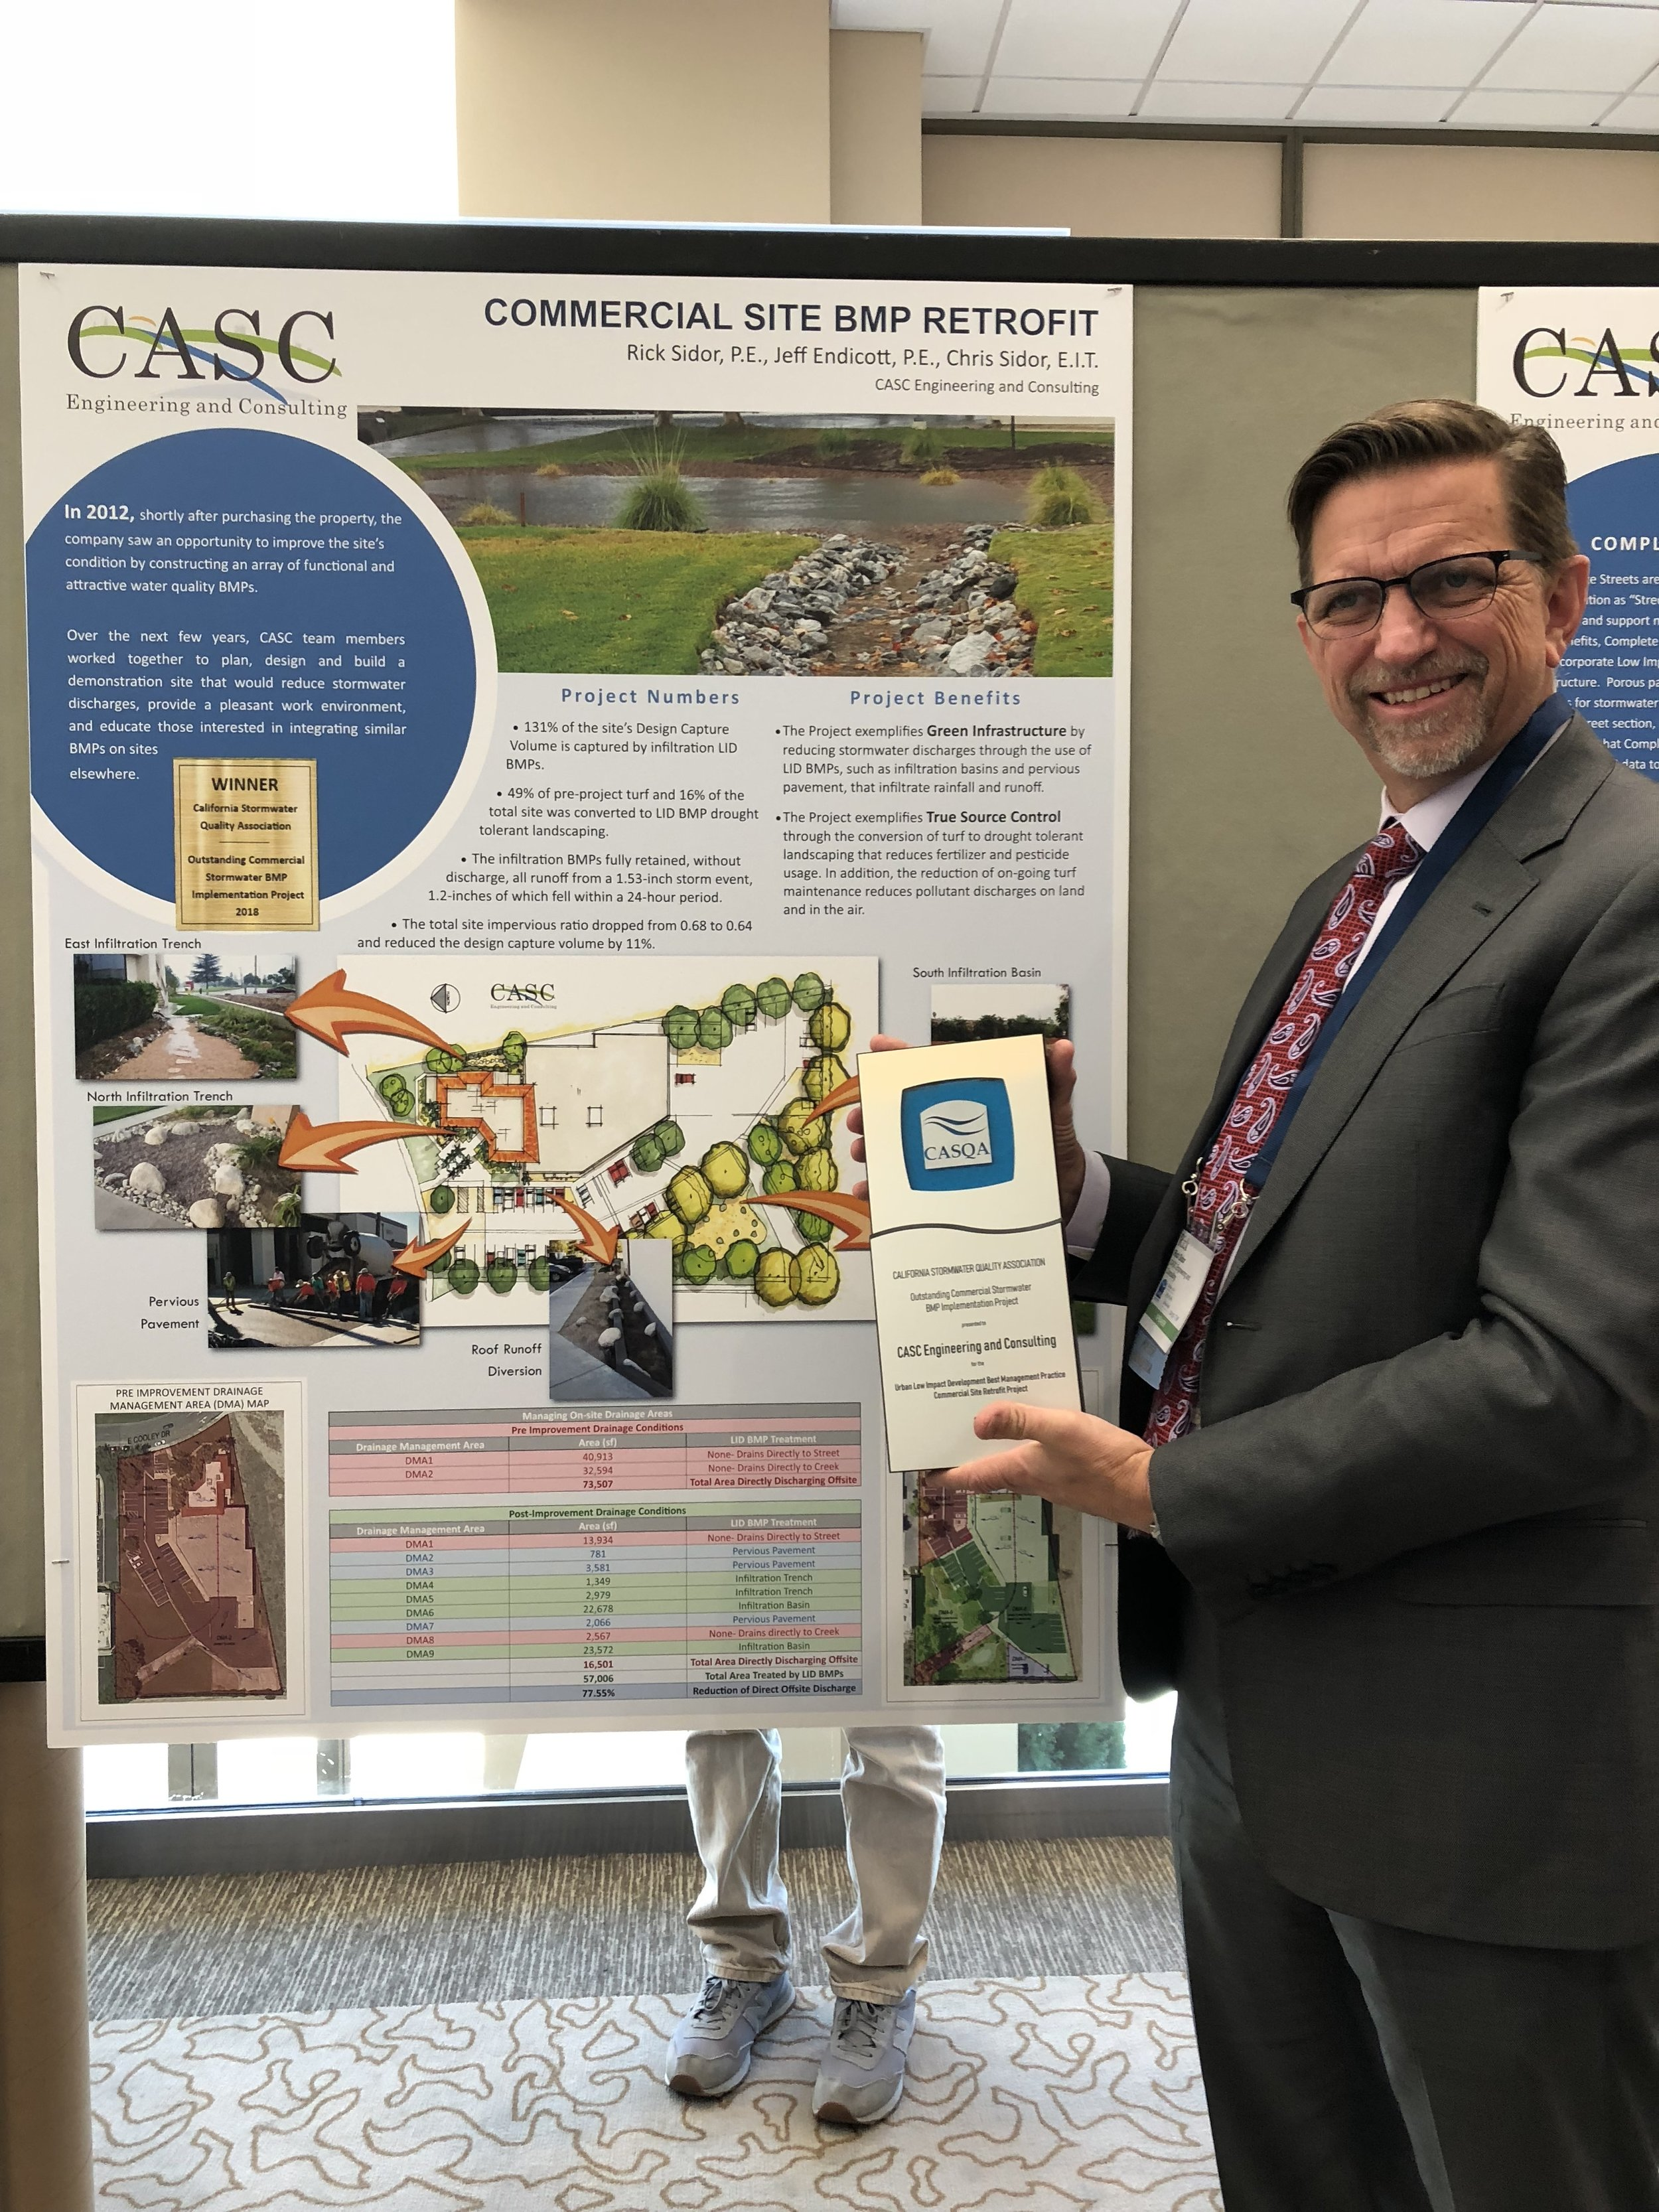 Image of Rick Sidor with 2018 CASQA award.